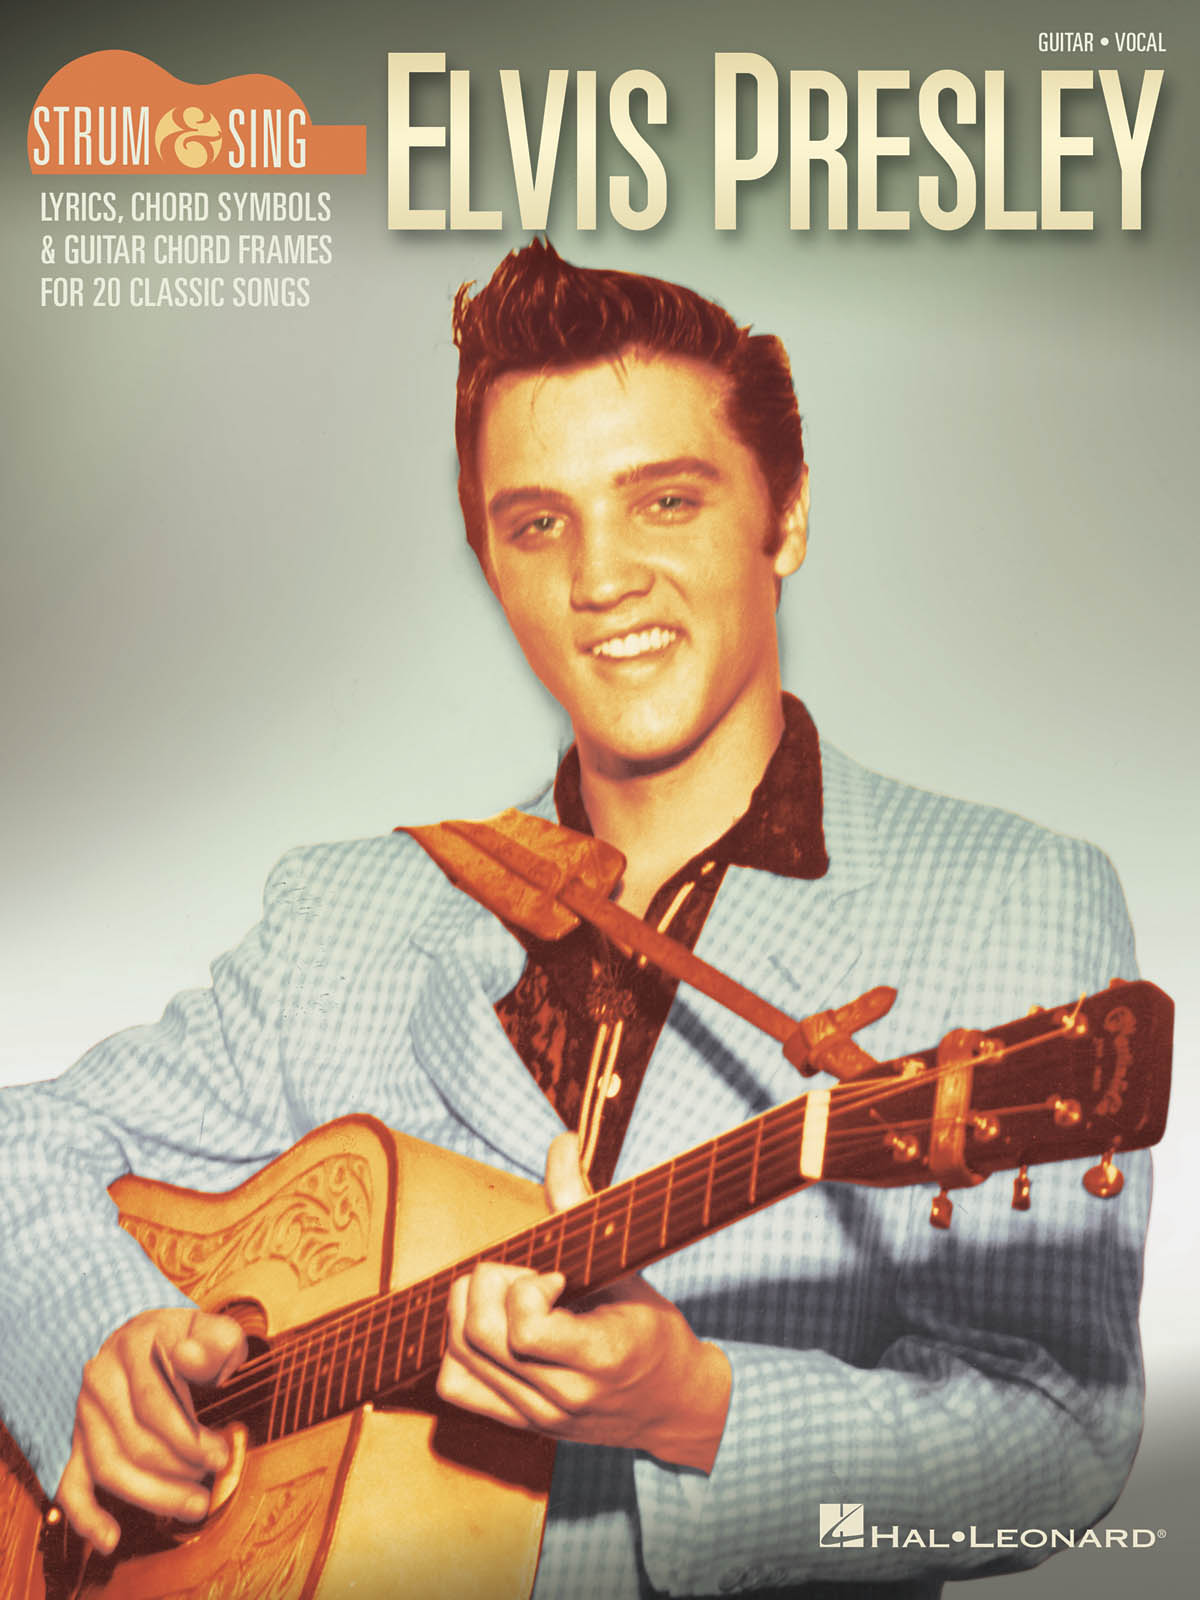 Elvis Presley - Strum and Sing Guitar: Guitar and Accomp.: Artist Songbook